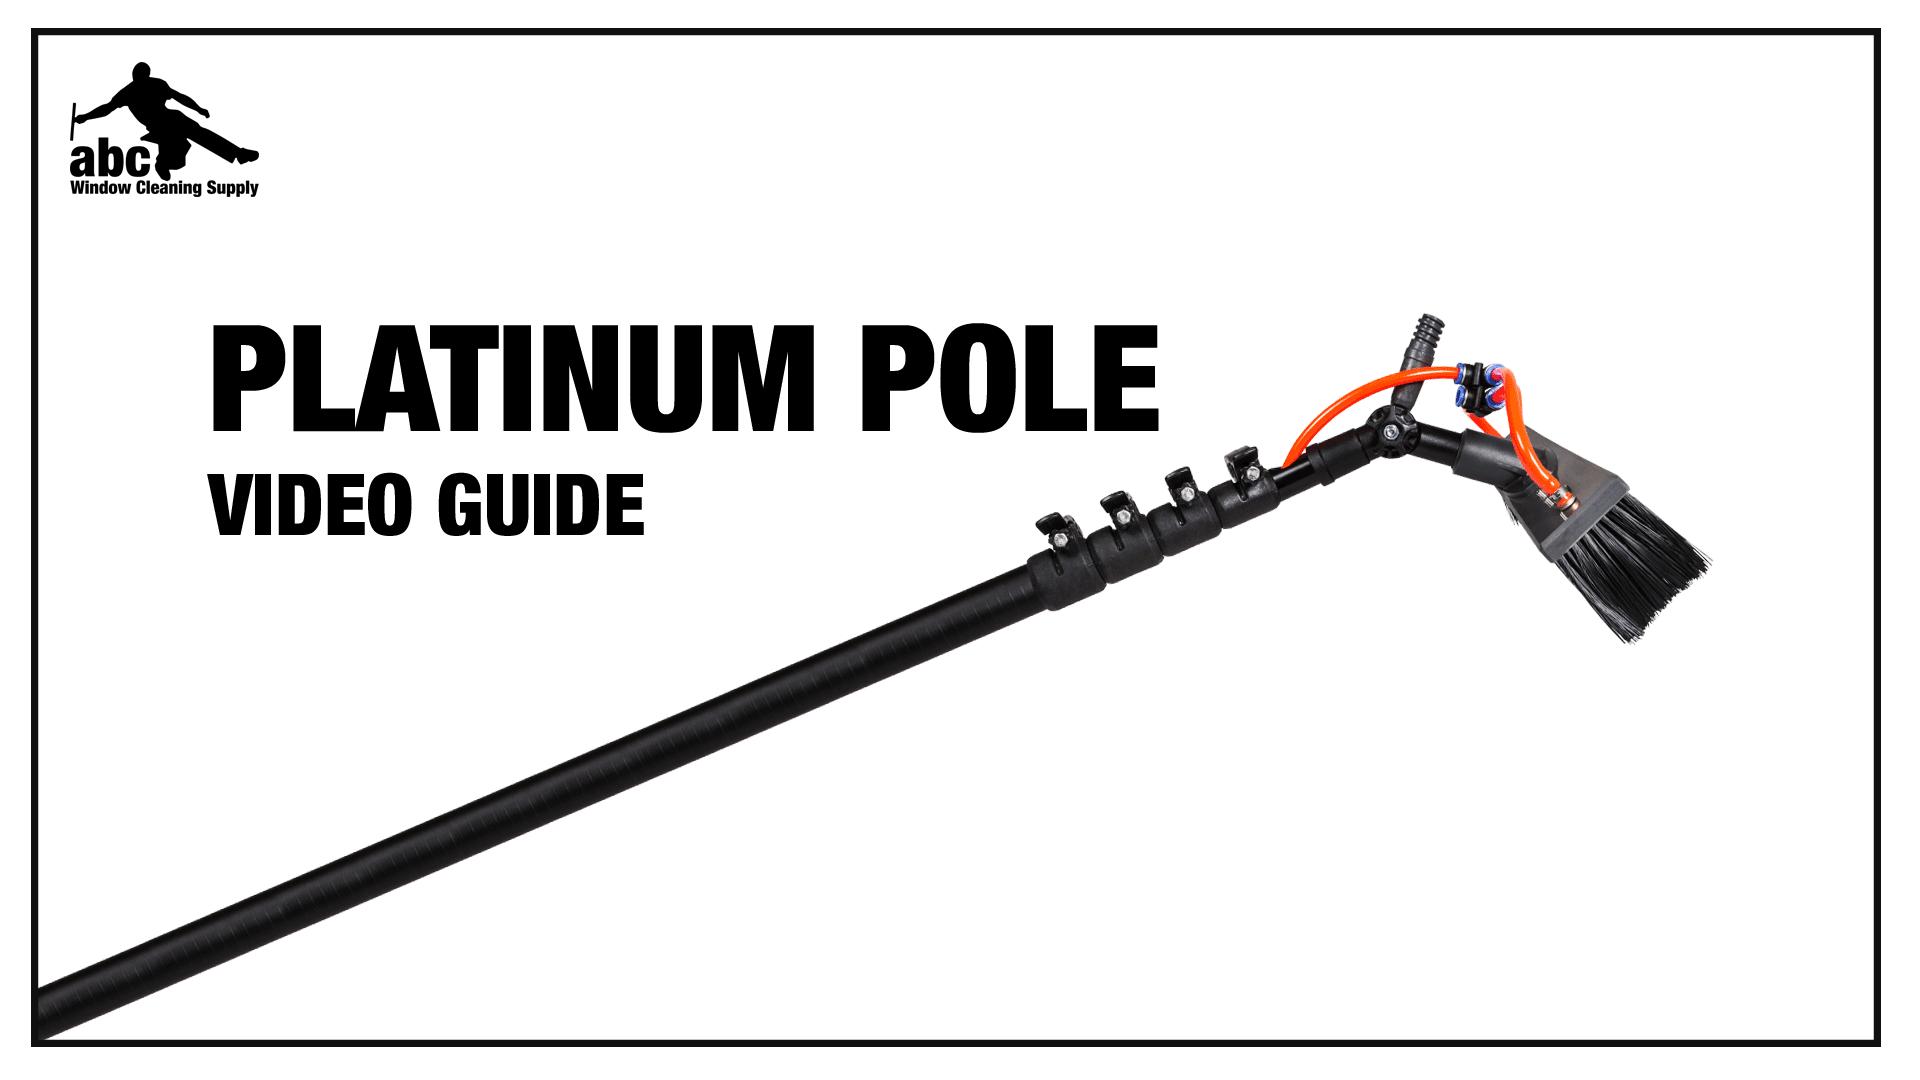 High Modulus Carbon Fiber Triple Crown Platinum Waterfed Pole